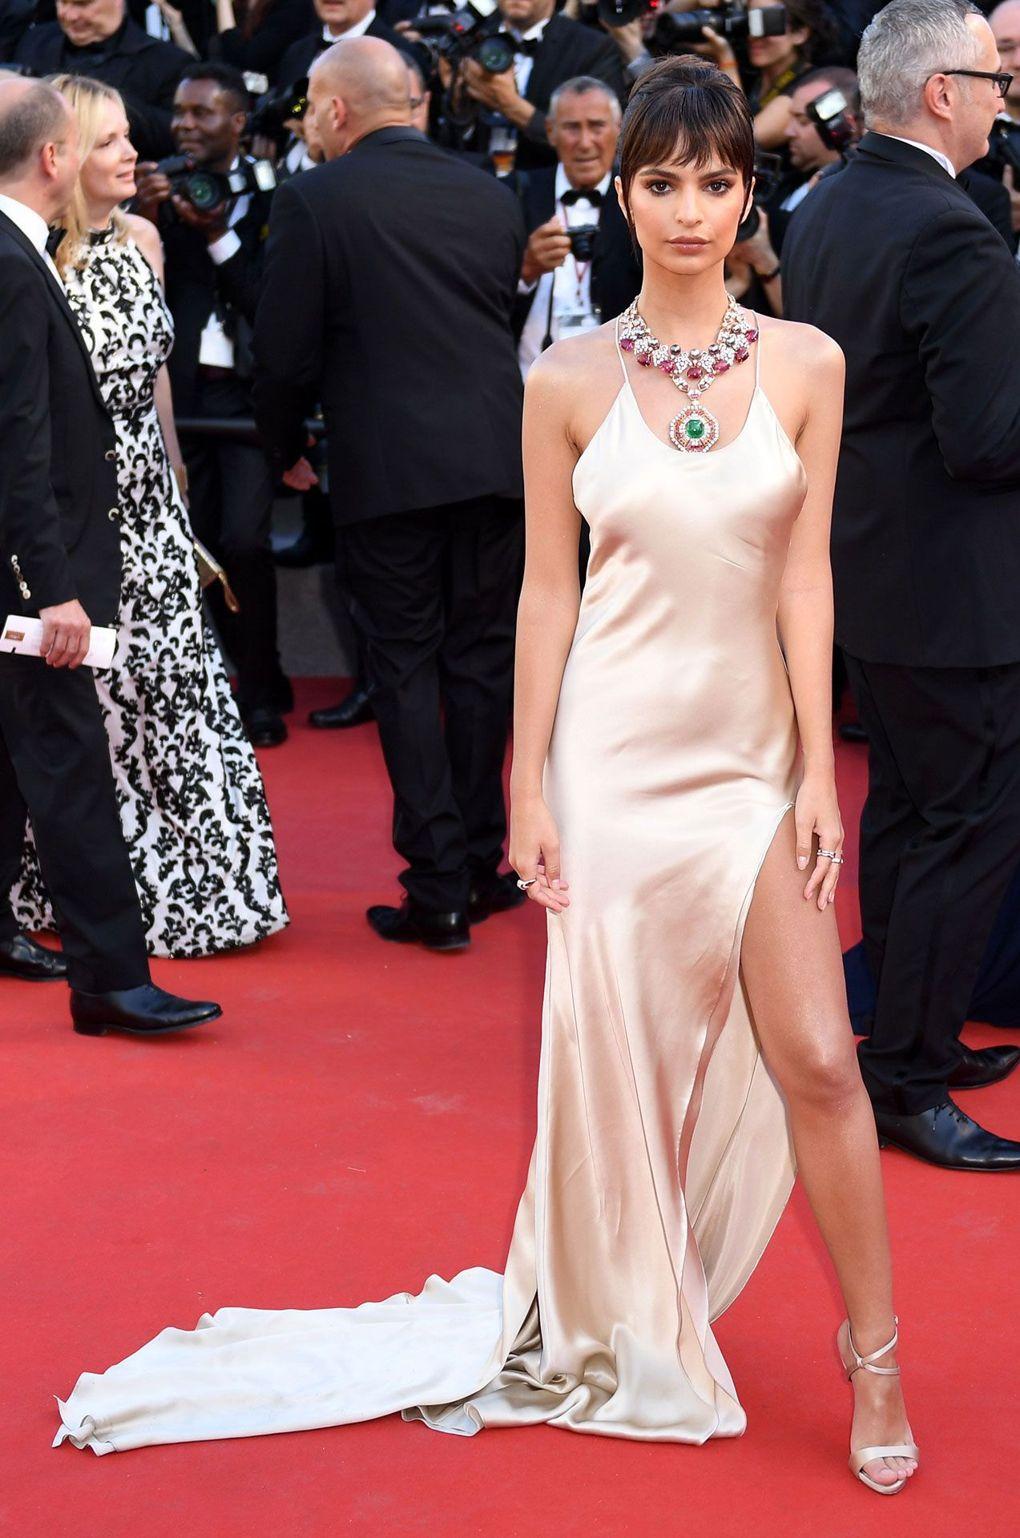 Emily Ratajkowski at Cannes Film Festival